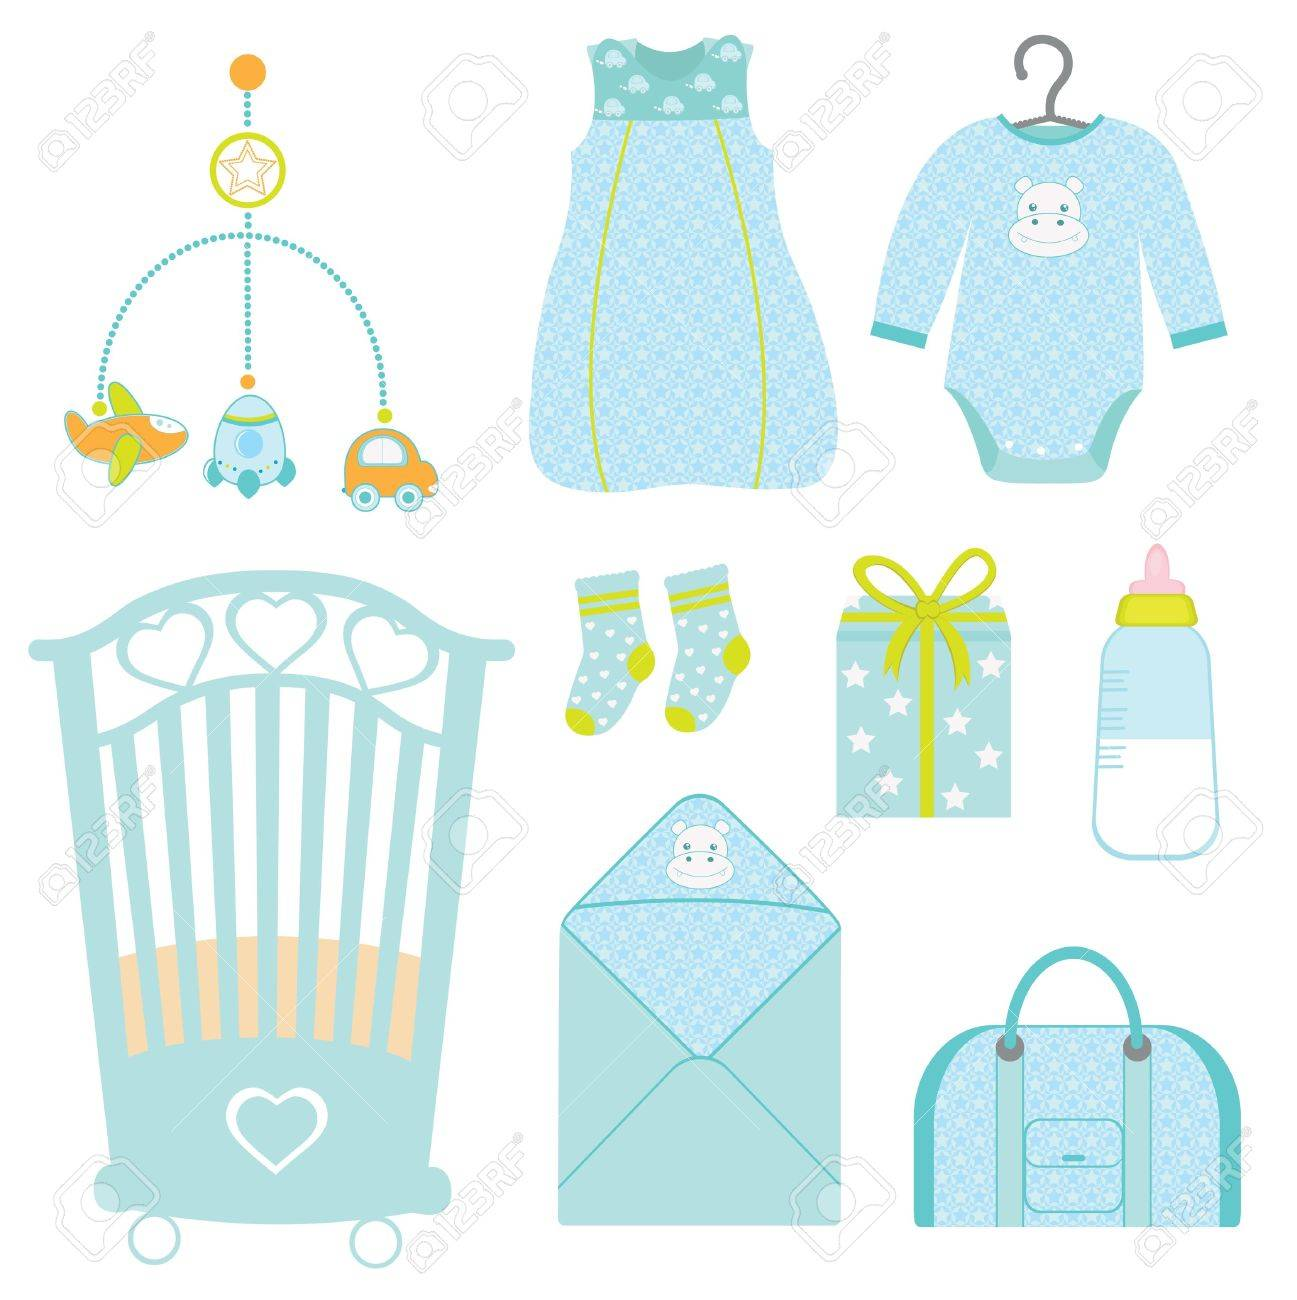 1297x1300 Cute Baby Boy Nursery Royalty Free Cliparts, Vectors, And Stock